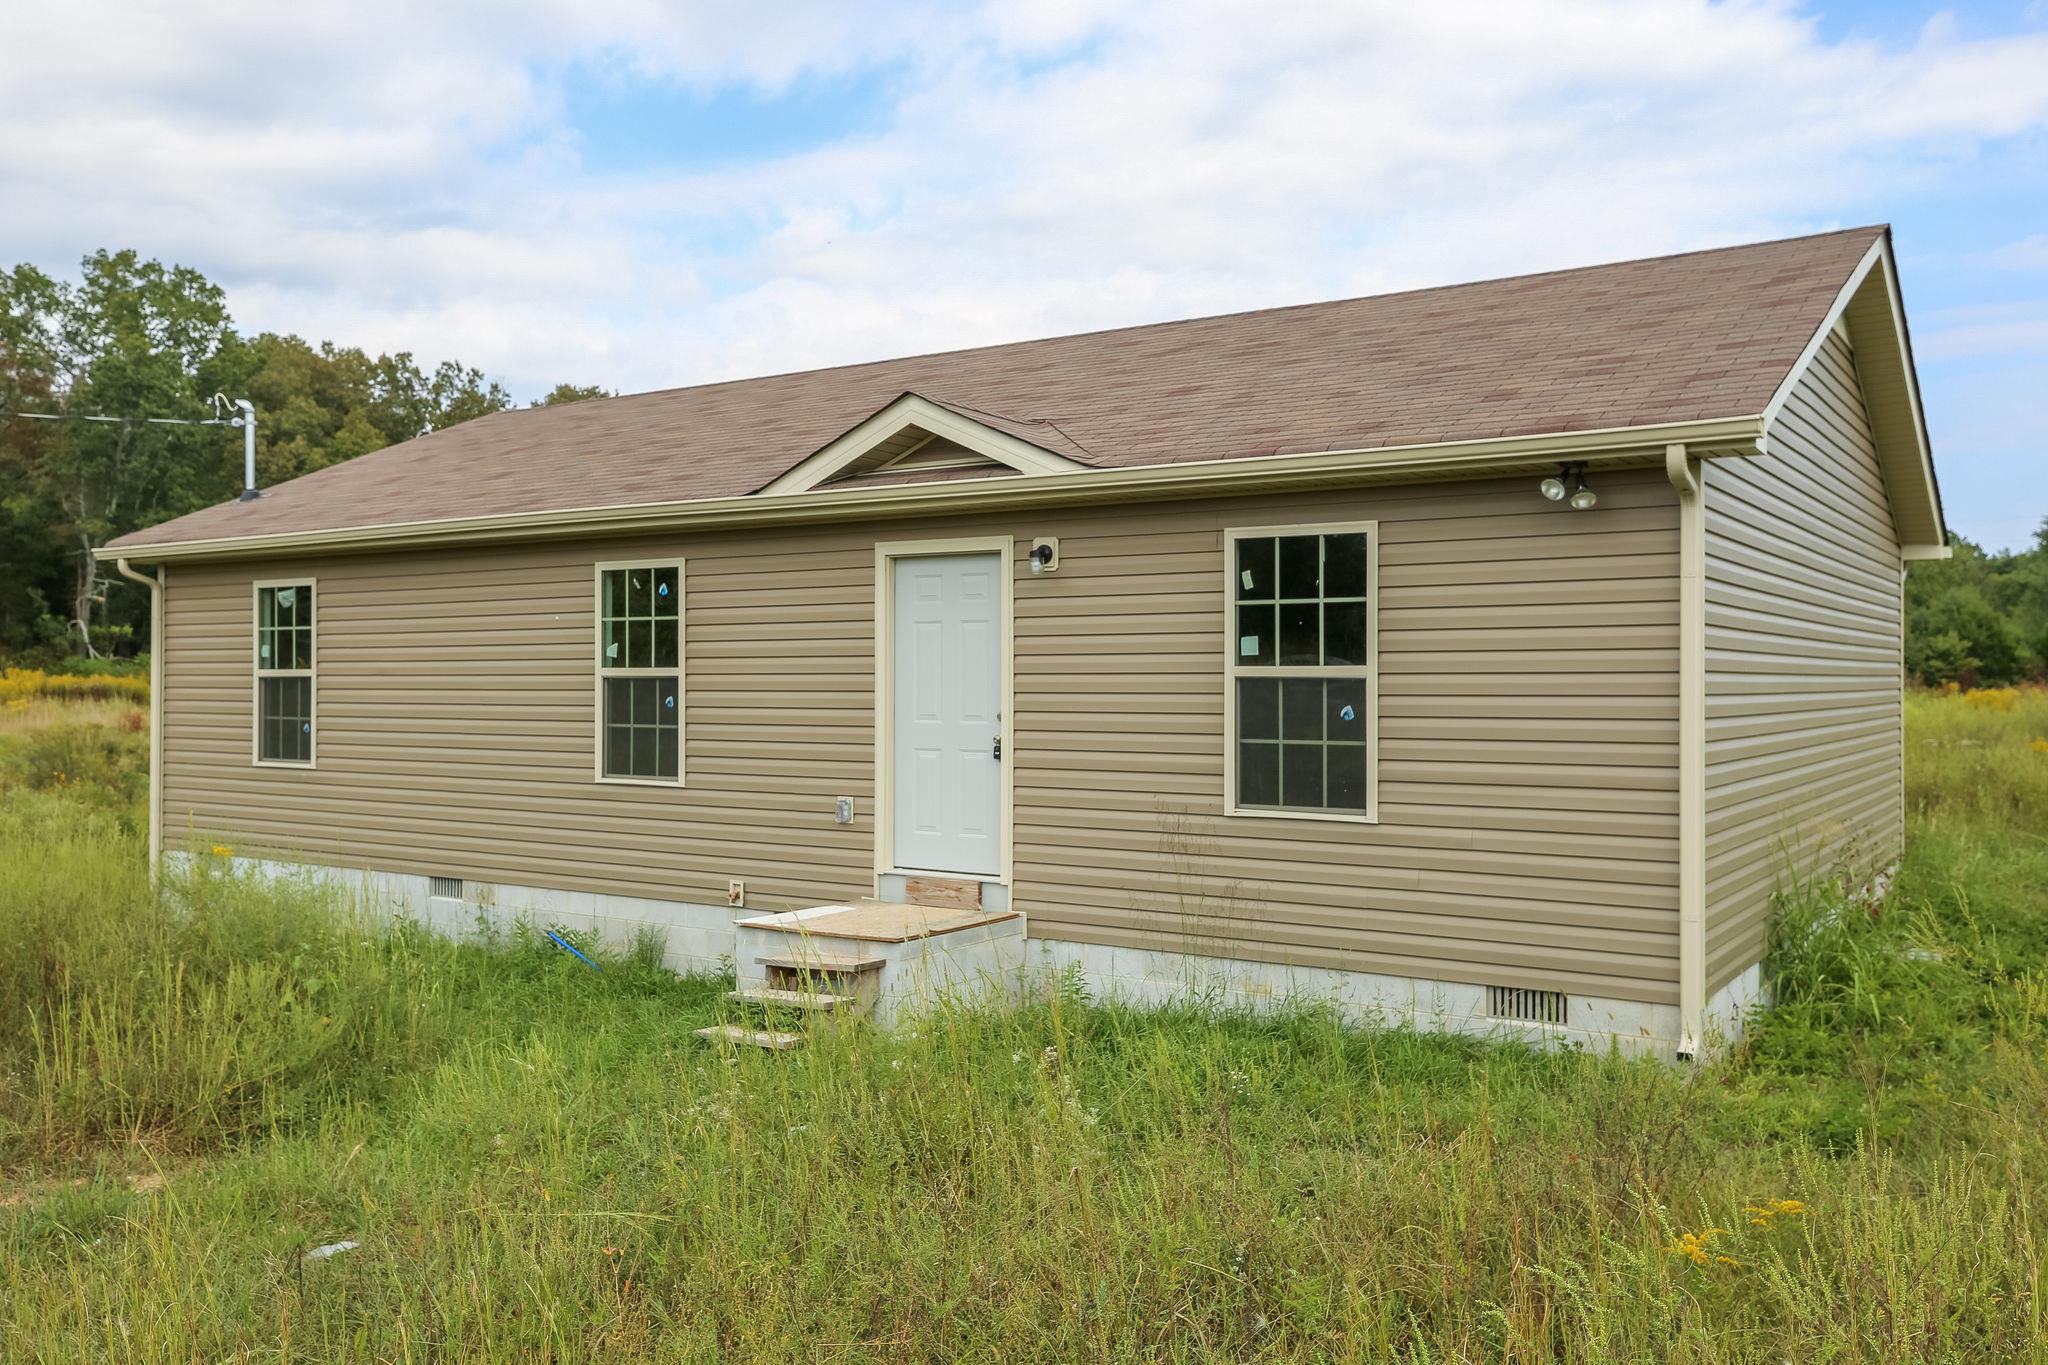 98 N C St, Hillsboro, TN 37342 - Hillsboro, TN real estate listing